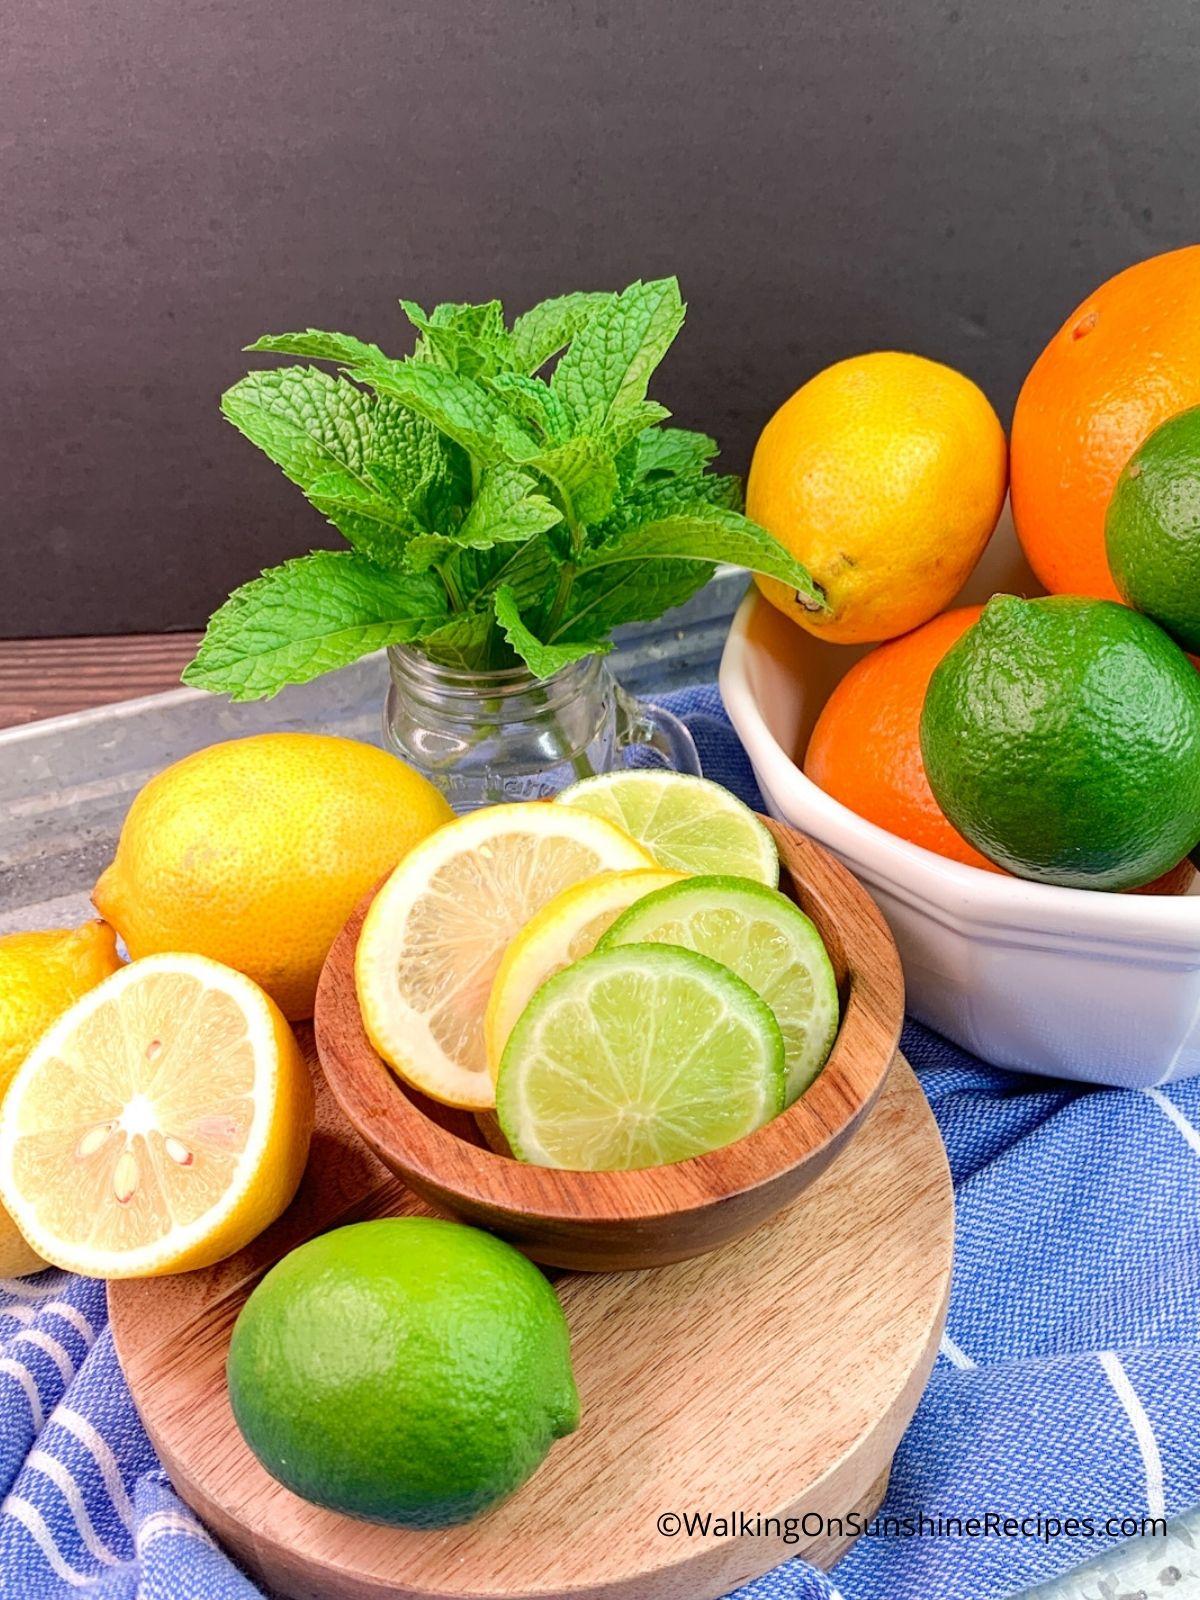 Ingredients, limes, lemons and organges.